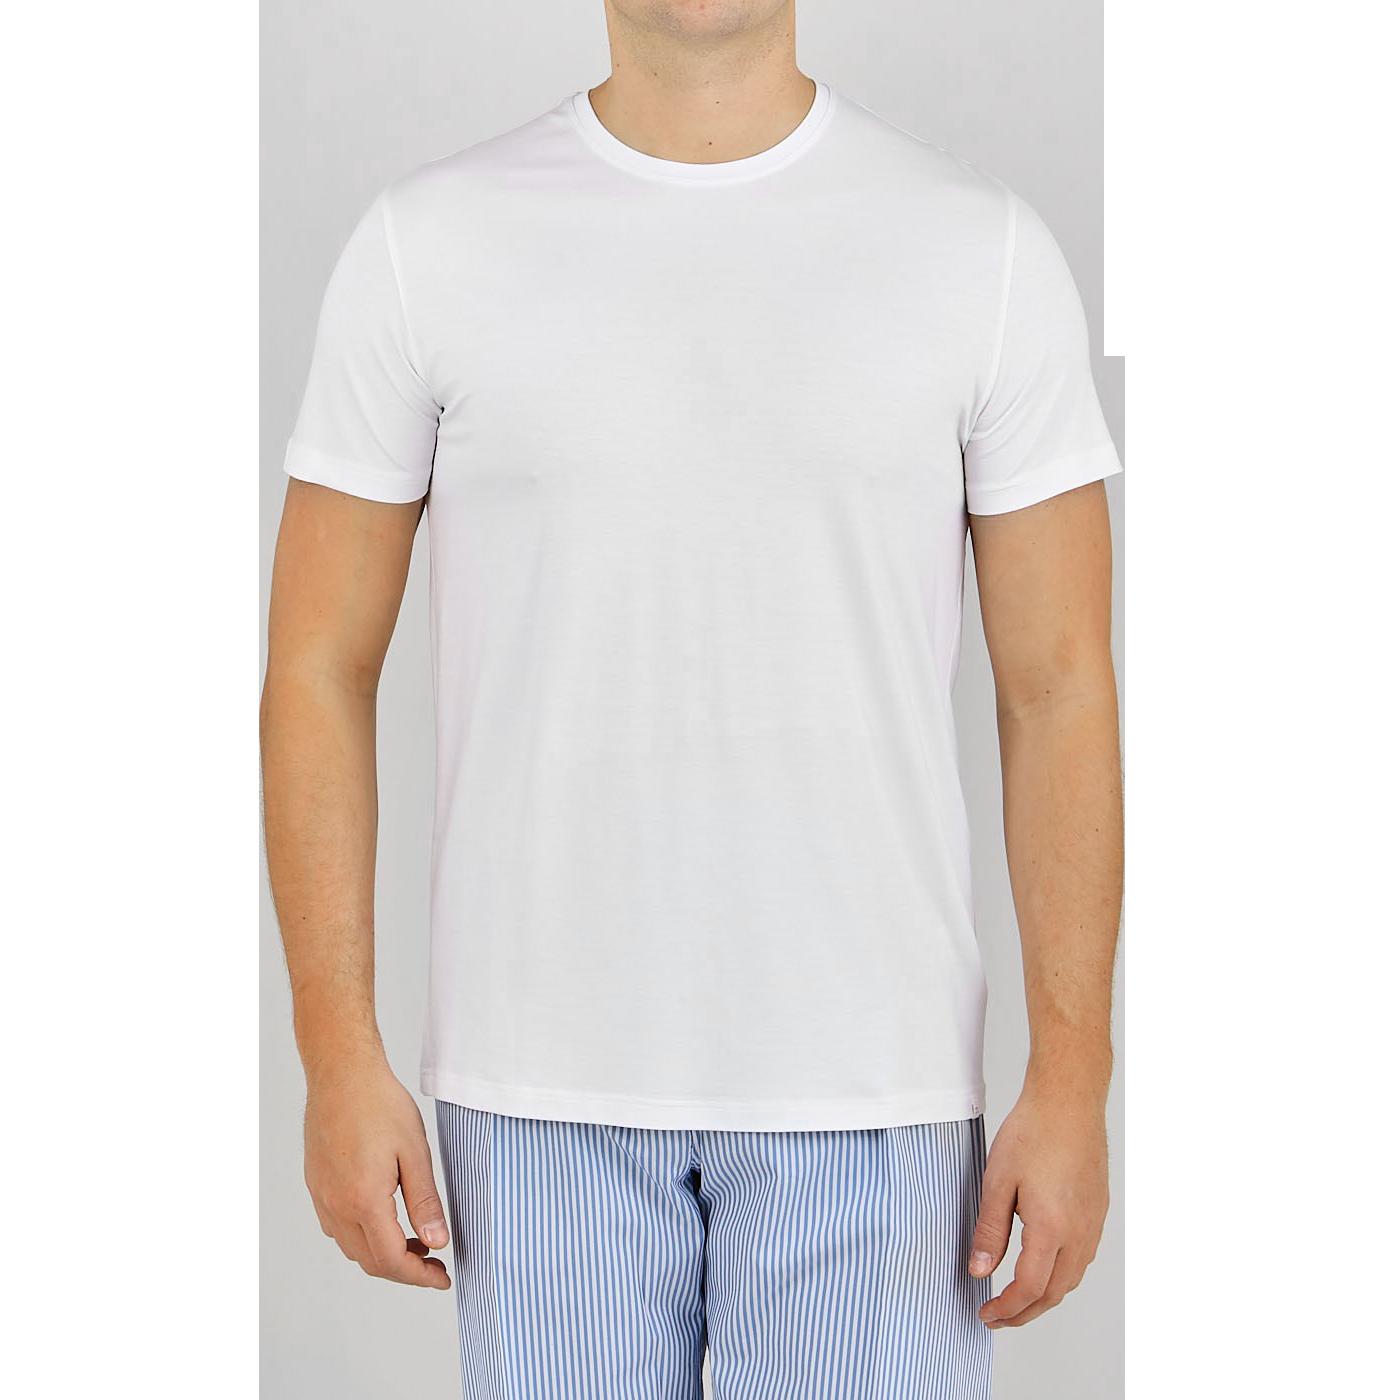 Derek Rose White Micro Modal Stretch T-shirt Front